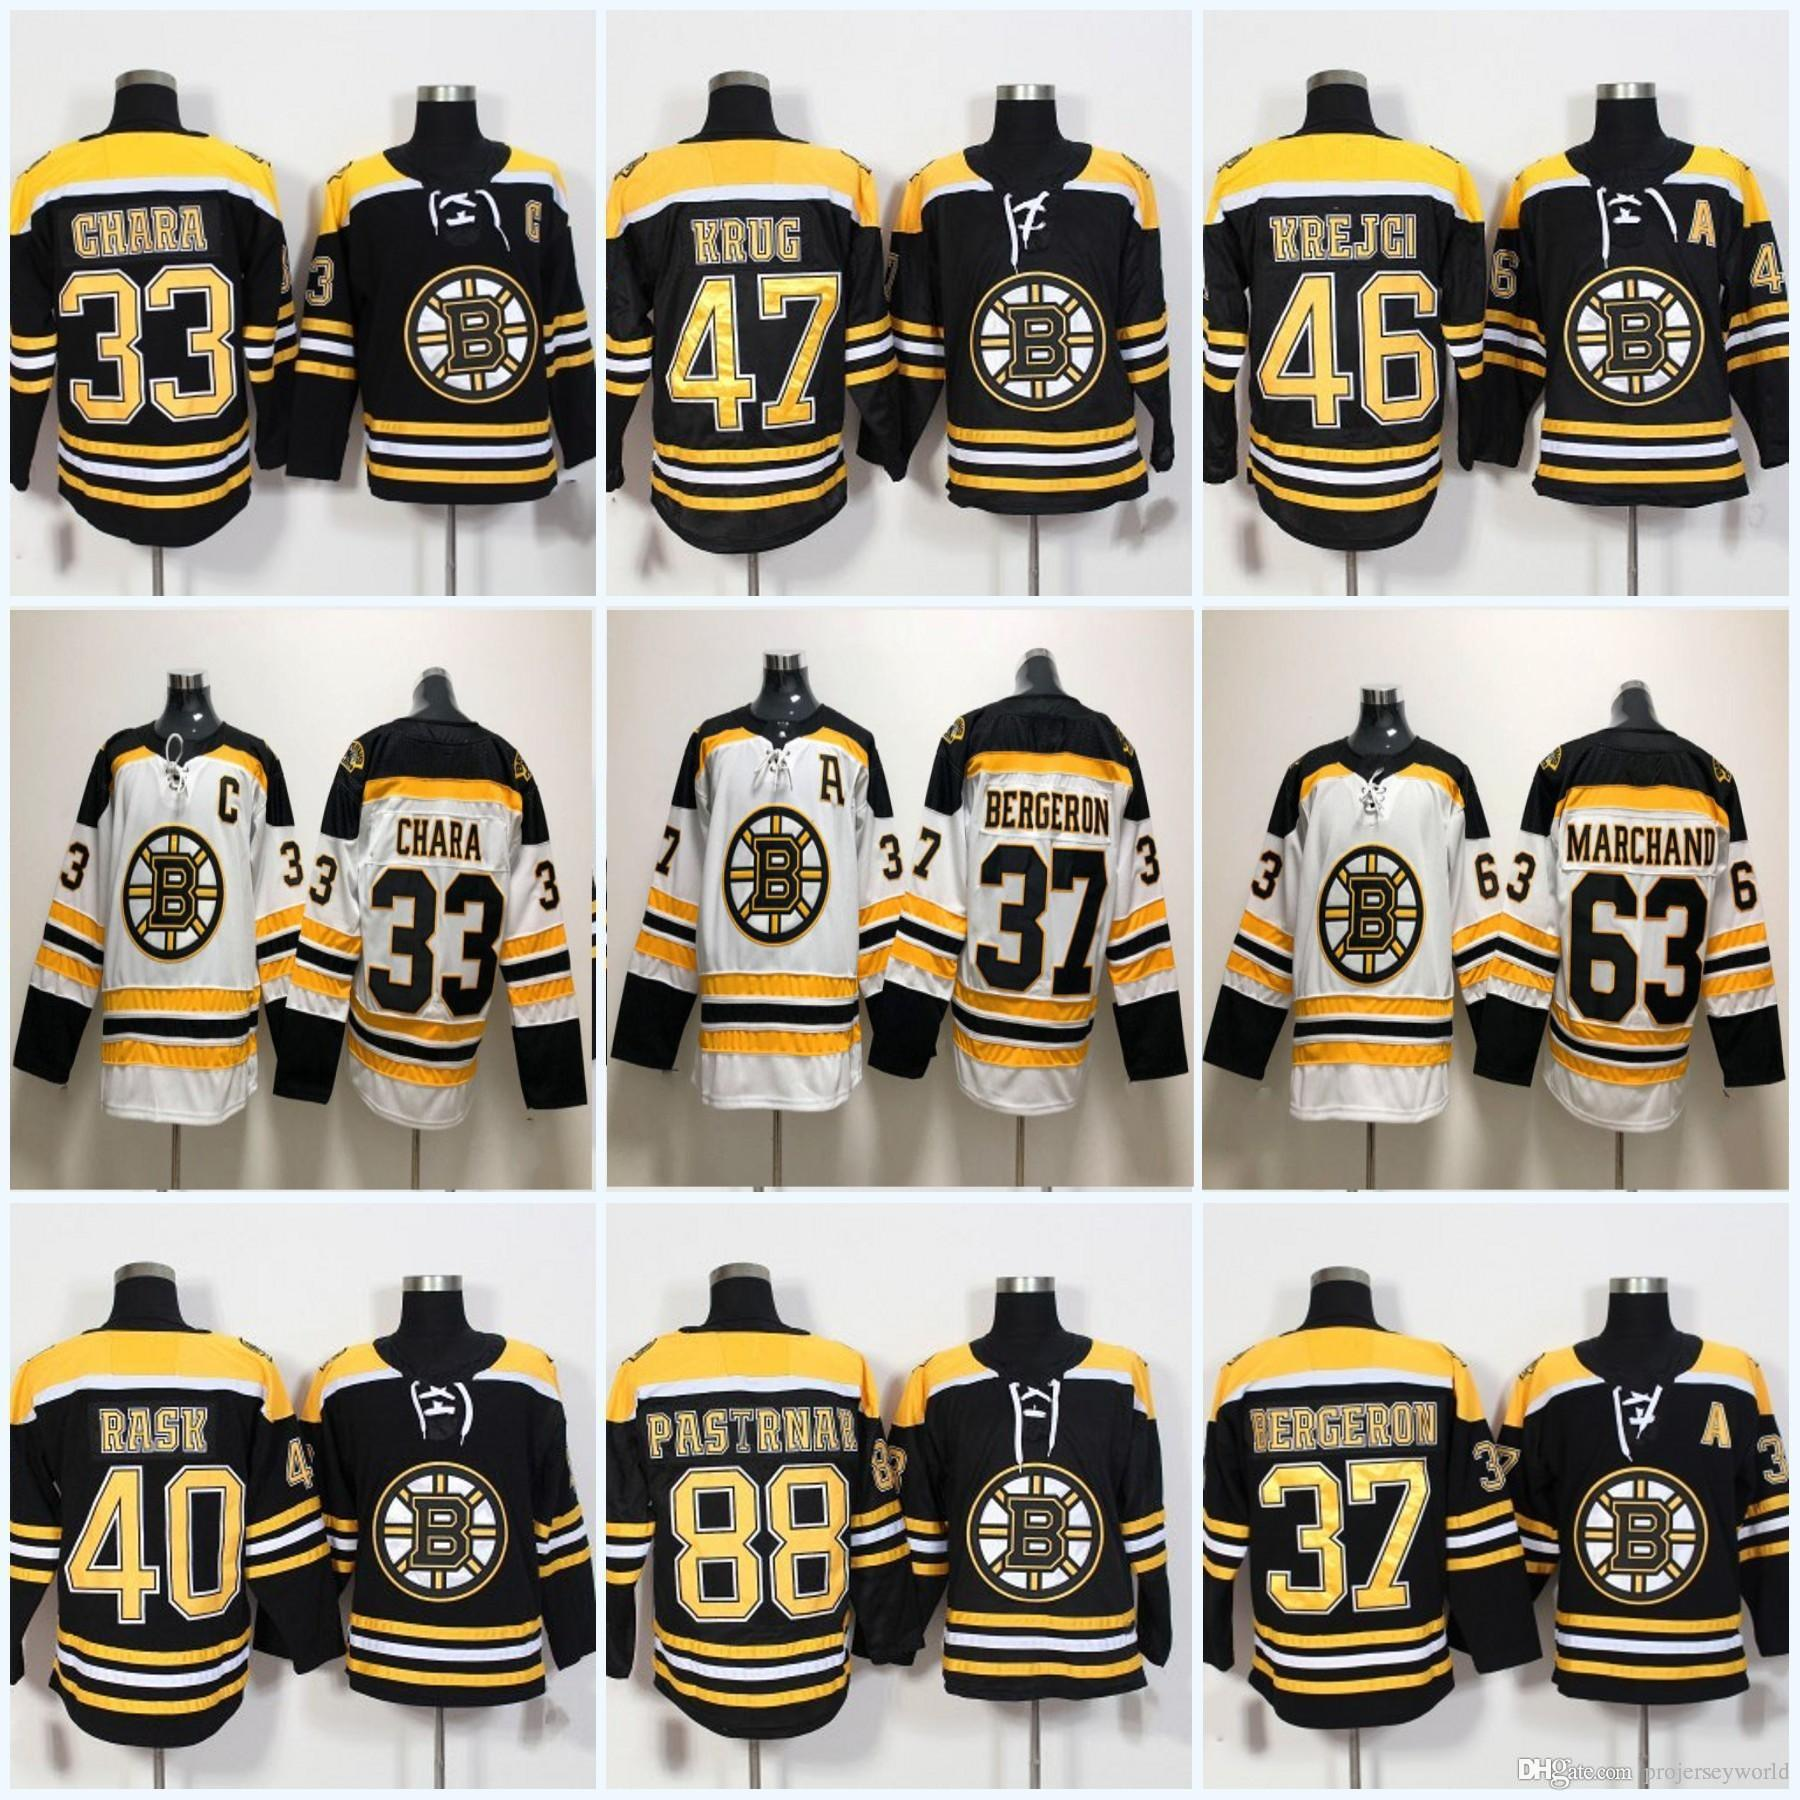 d4bf1d324f3 Acquista 37 Patrice Bergeron 2018 Boston Bruins 33 Zdeno Chara 73 Charlie  McAvoy 47 Torey Krug 88 David Pastrnak 63 Brad Marchand Maglia Da Hockey A   24.37 ...